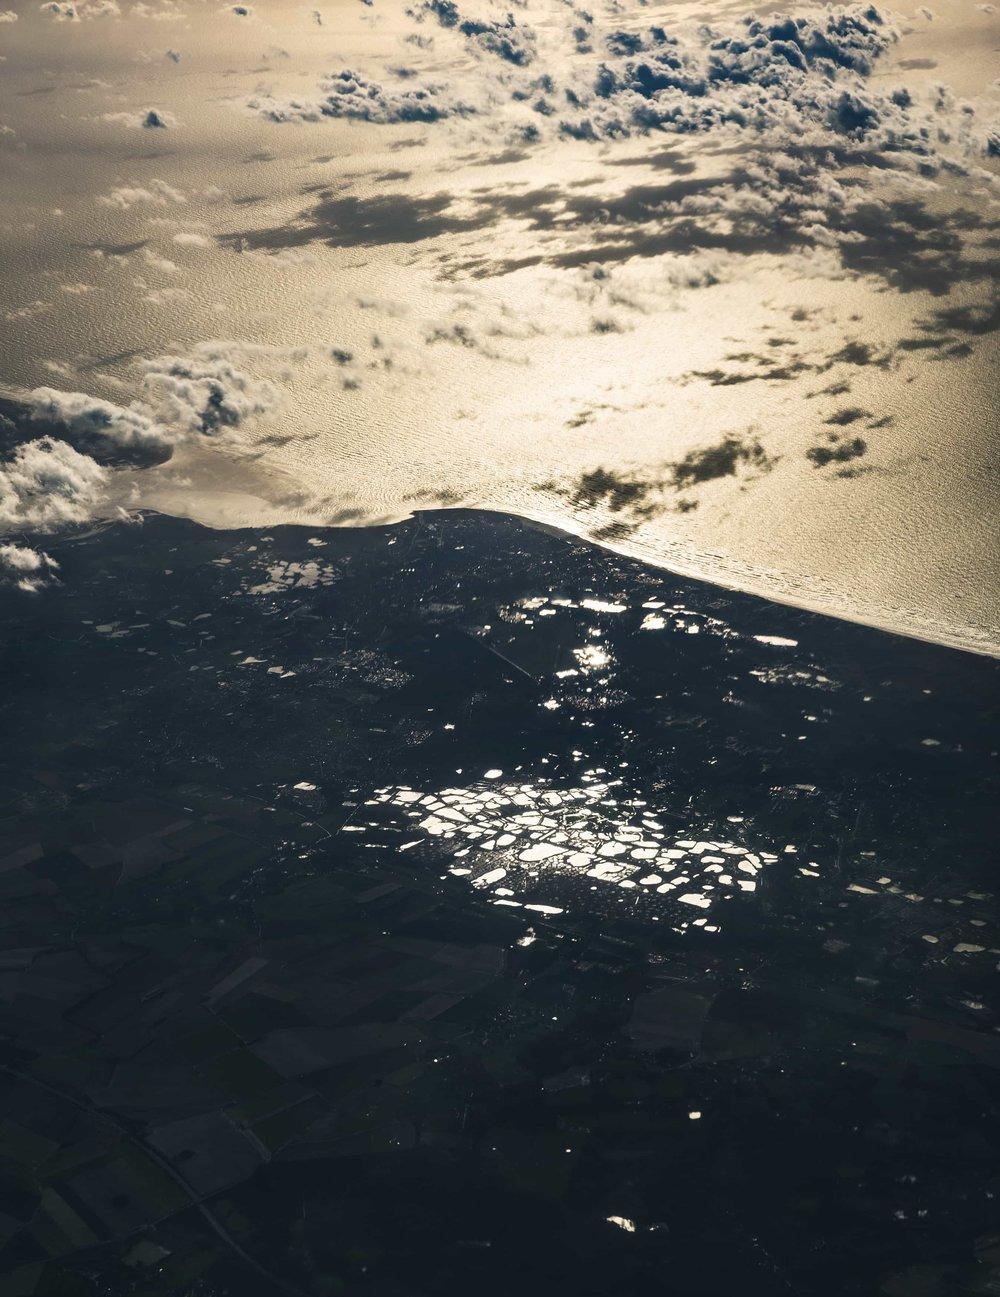 aerial_landscape_photography_fabio_burrelli_photographer_5.jpg